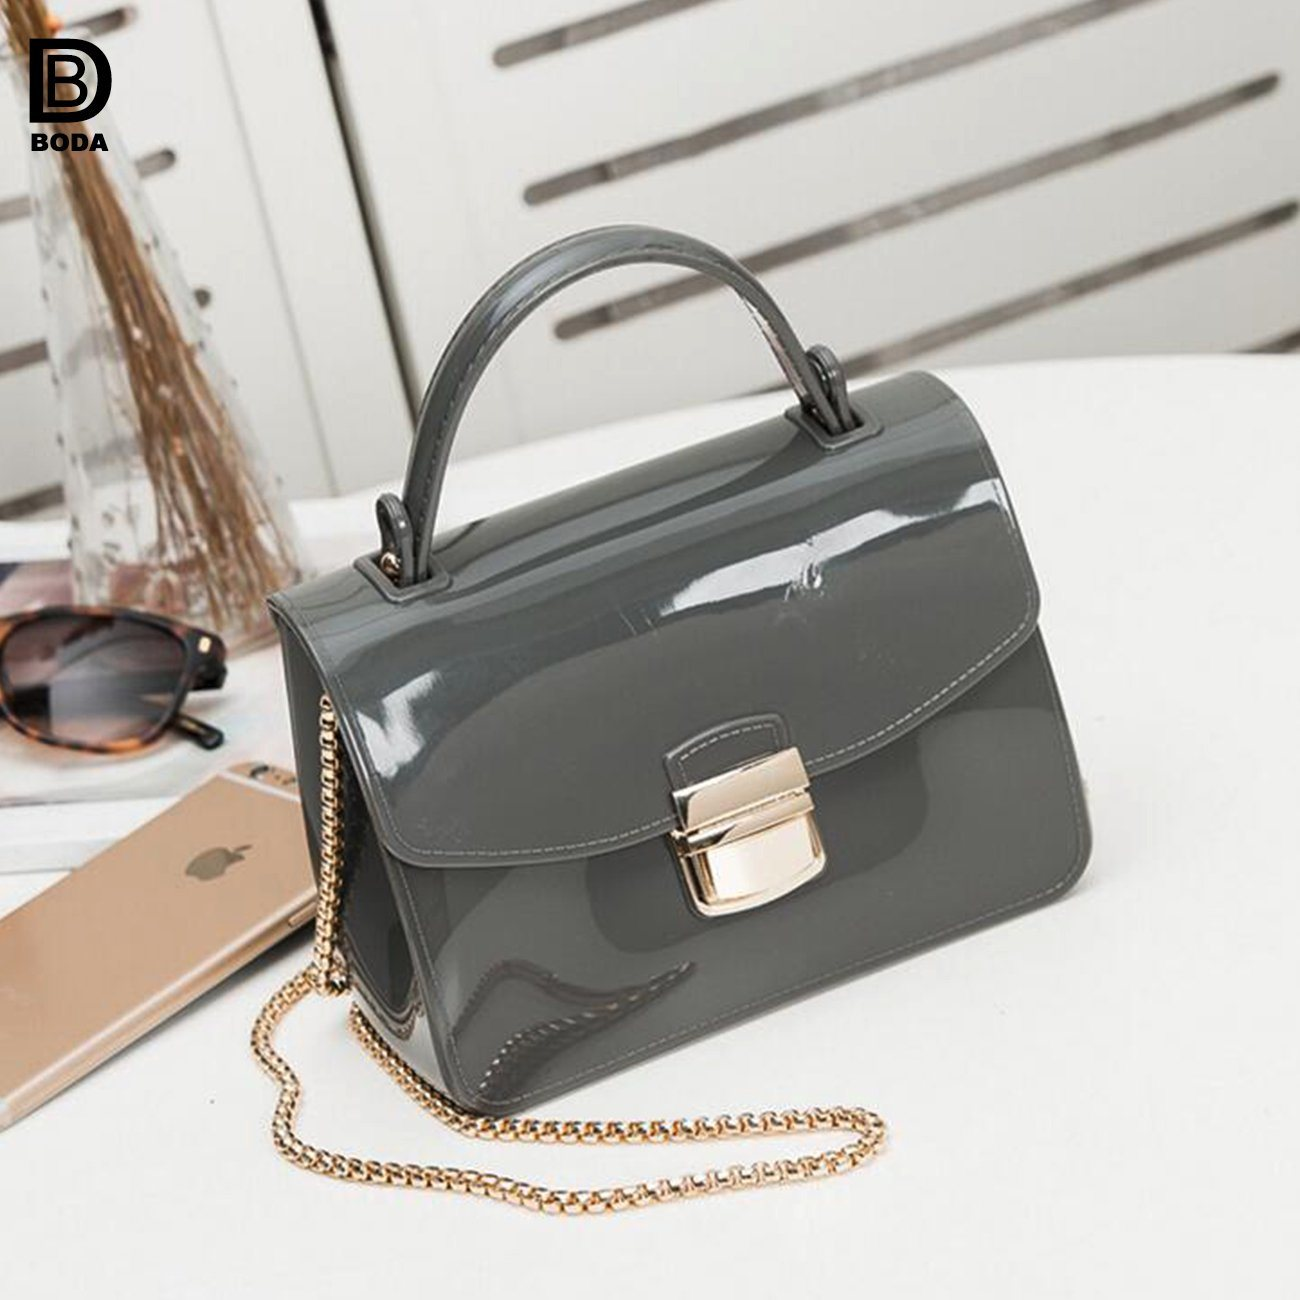 876892797a China Wholesale Jelly Candy Color Ladies Handbag with Single Shoulder Strap  - China Handbag